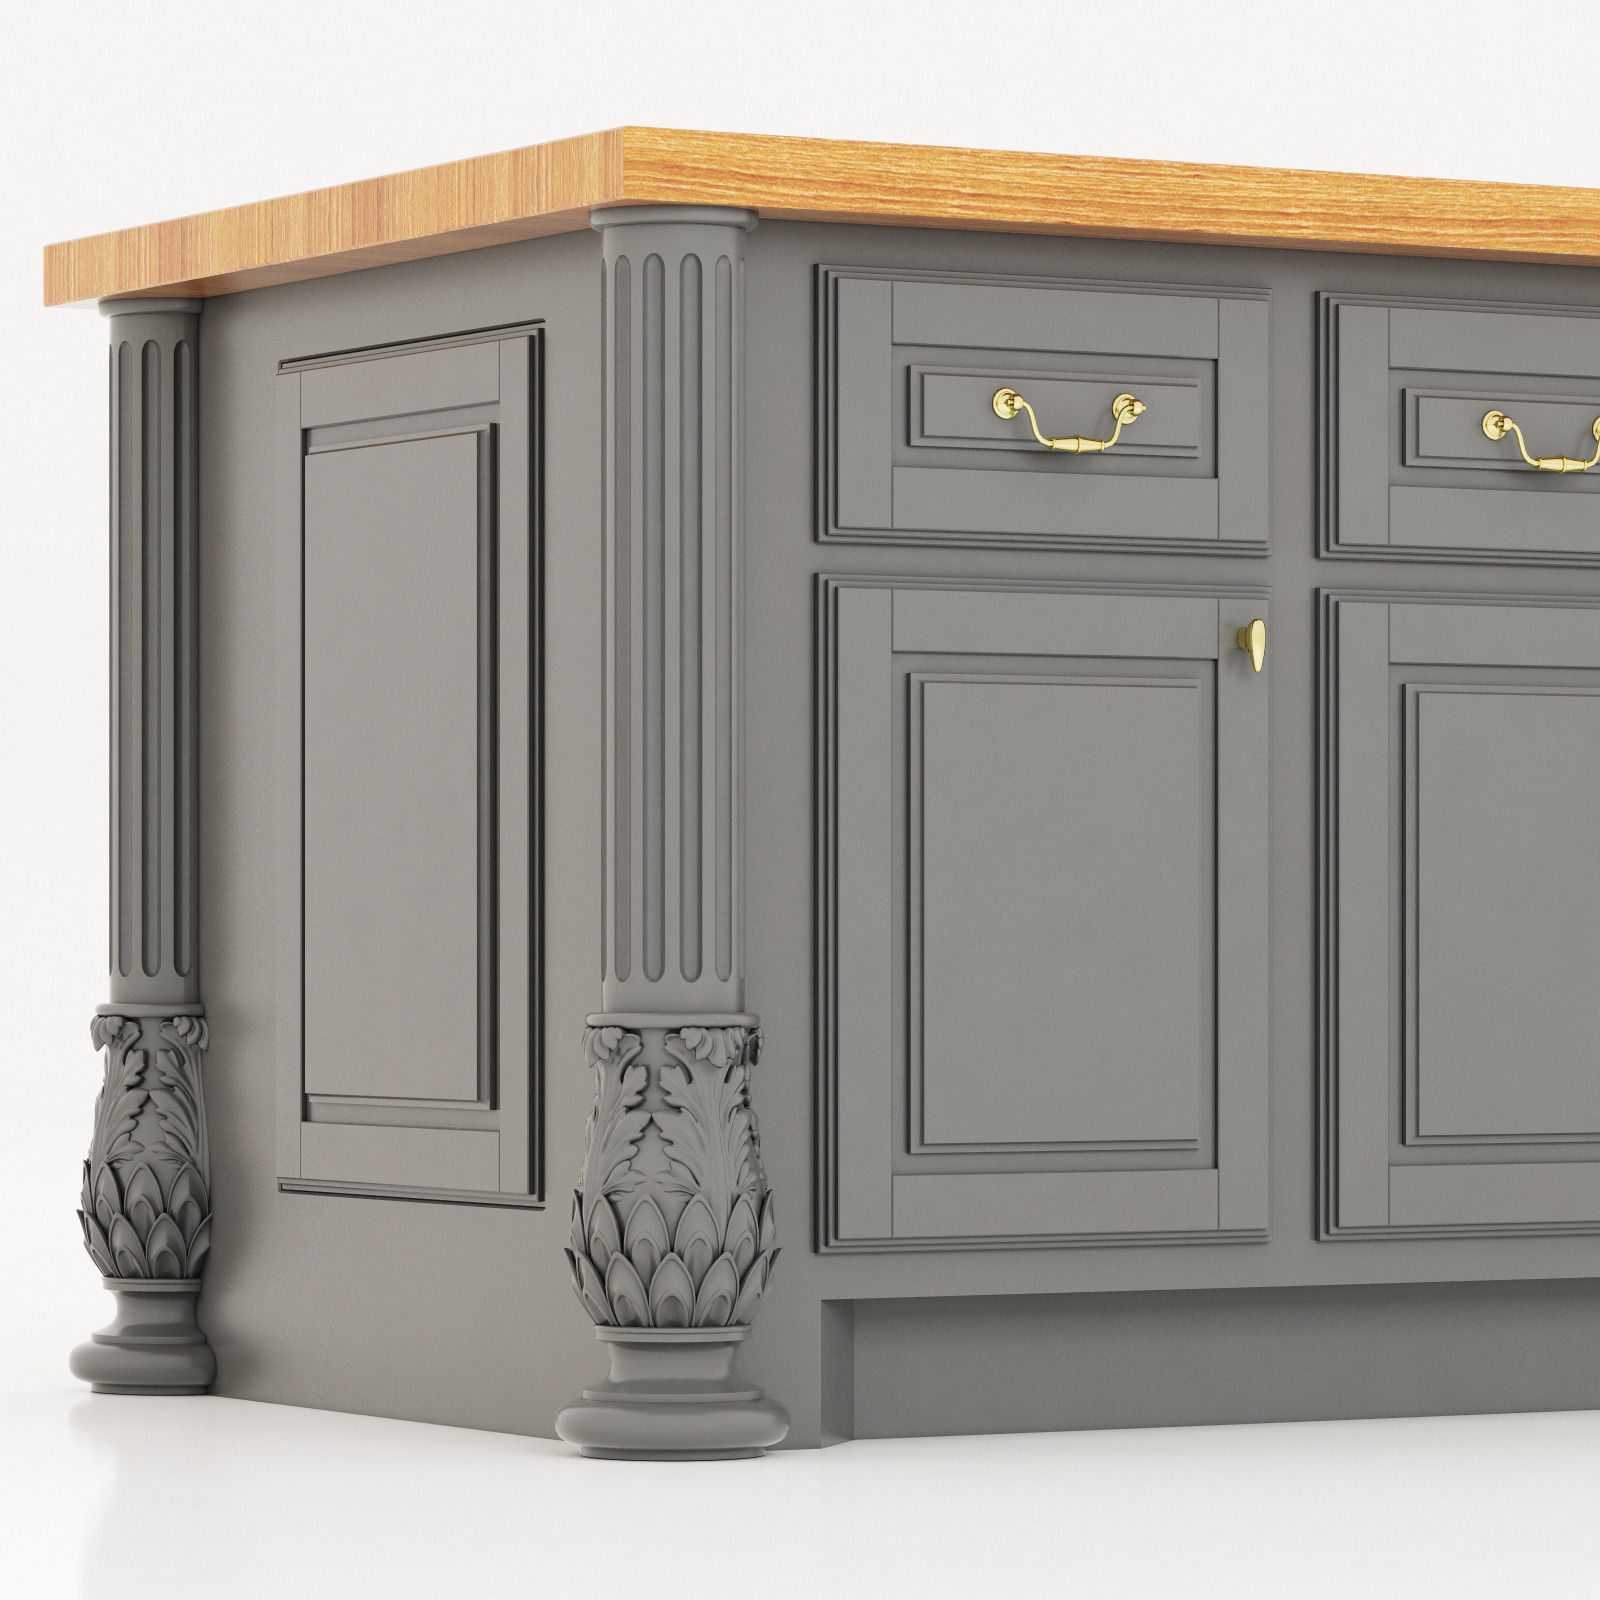 Kitchen island lyn design -  Lyn Design By Hardware Resources Milanese Kitchen Island 3d Model Max Obj 3ds Fbx Mtl 5